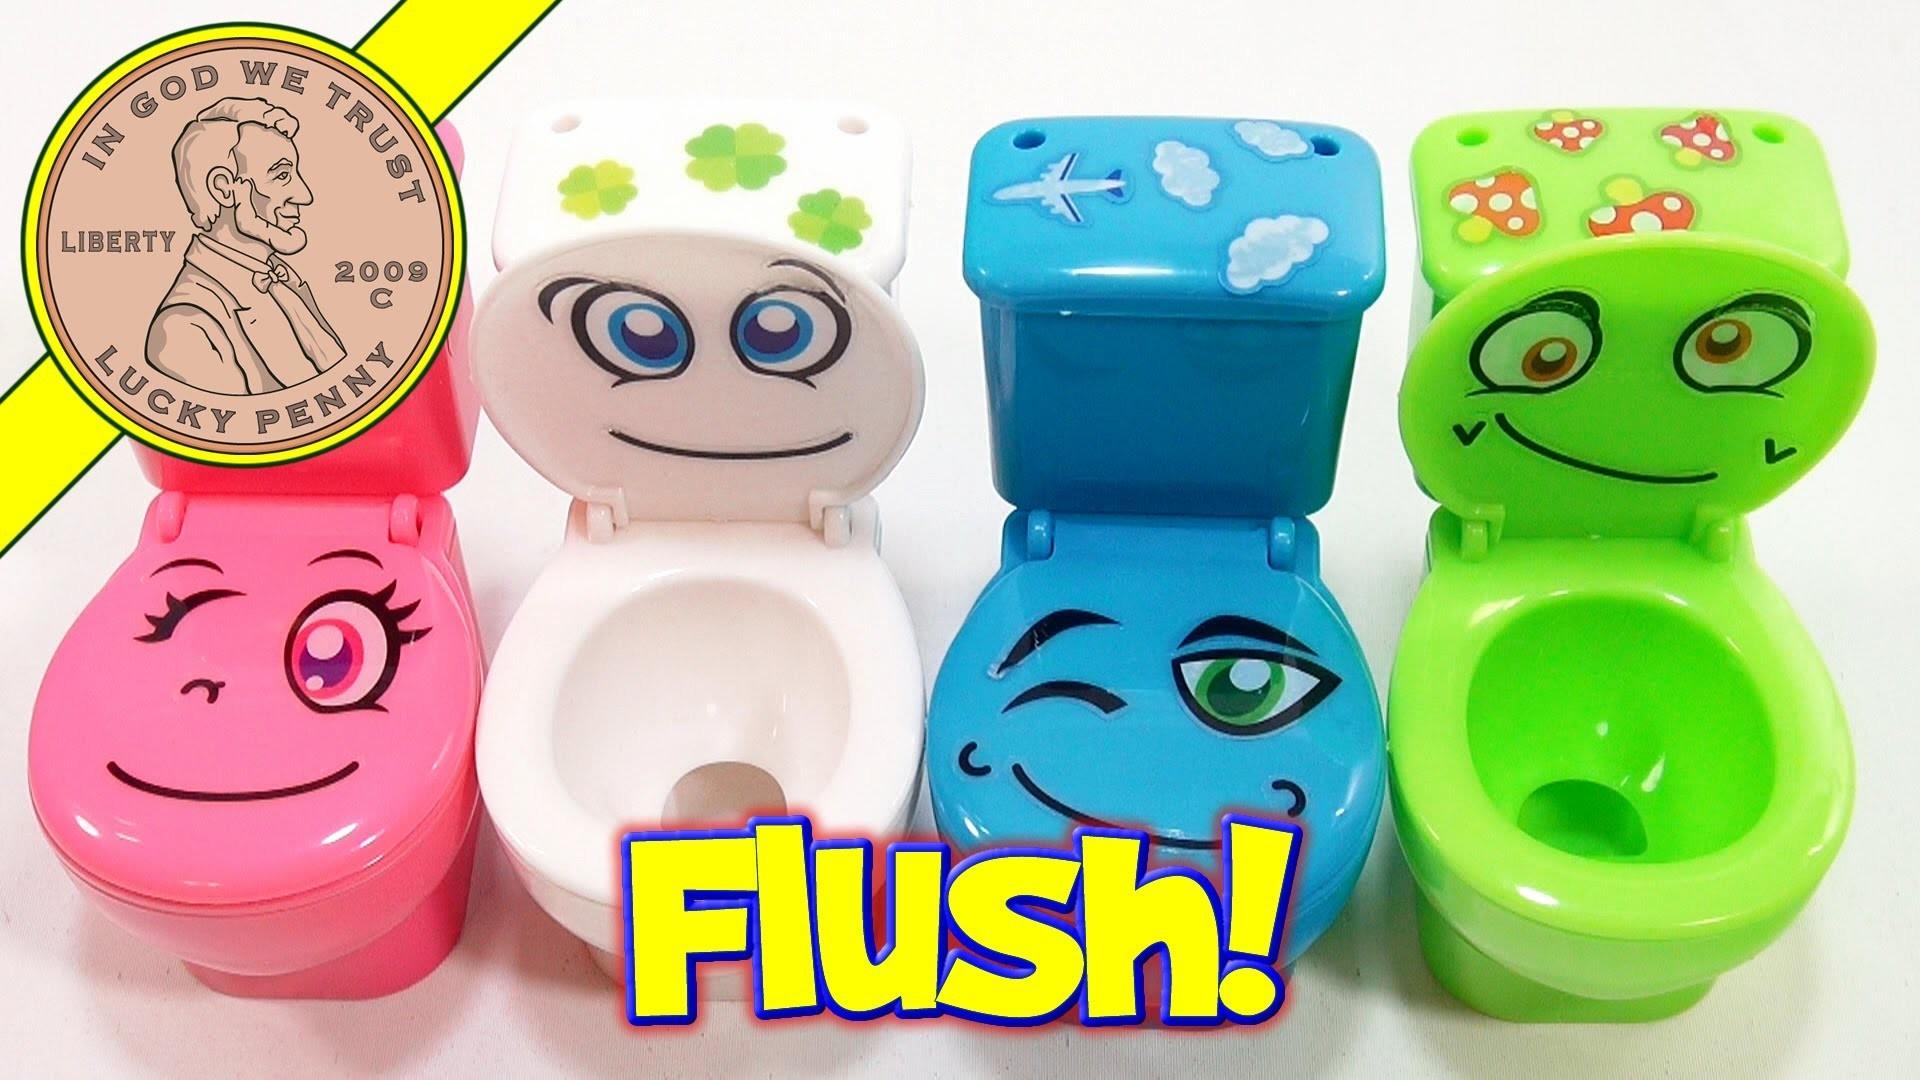 Moko Moko Mokolet Fun Fizzing Ramune Cola Candy Toilet! - Japanese DIY Kit